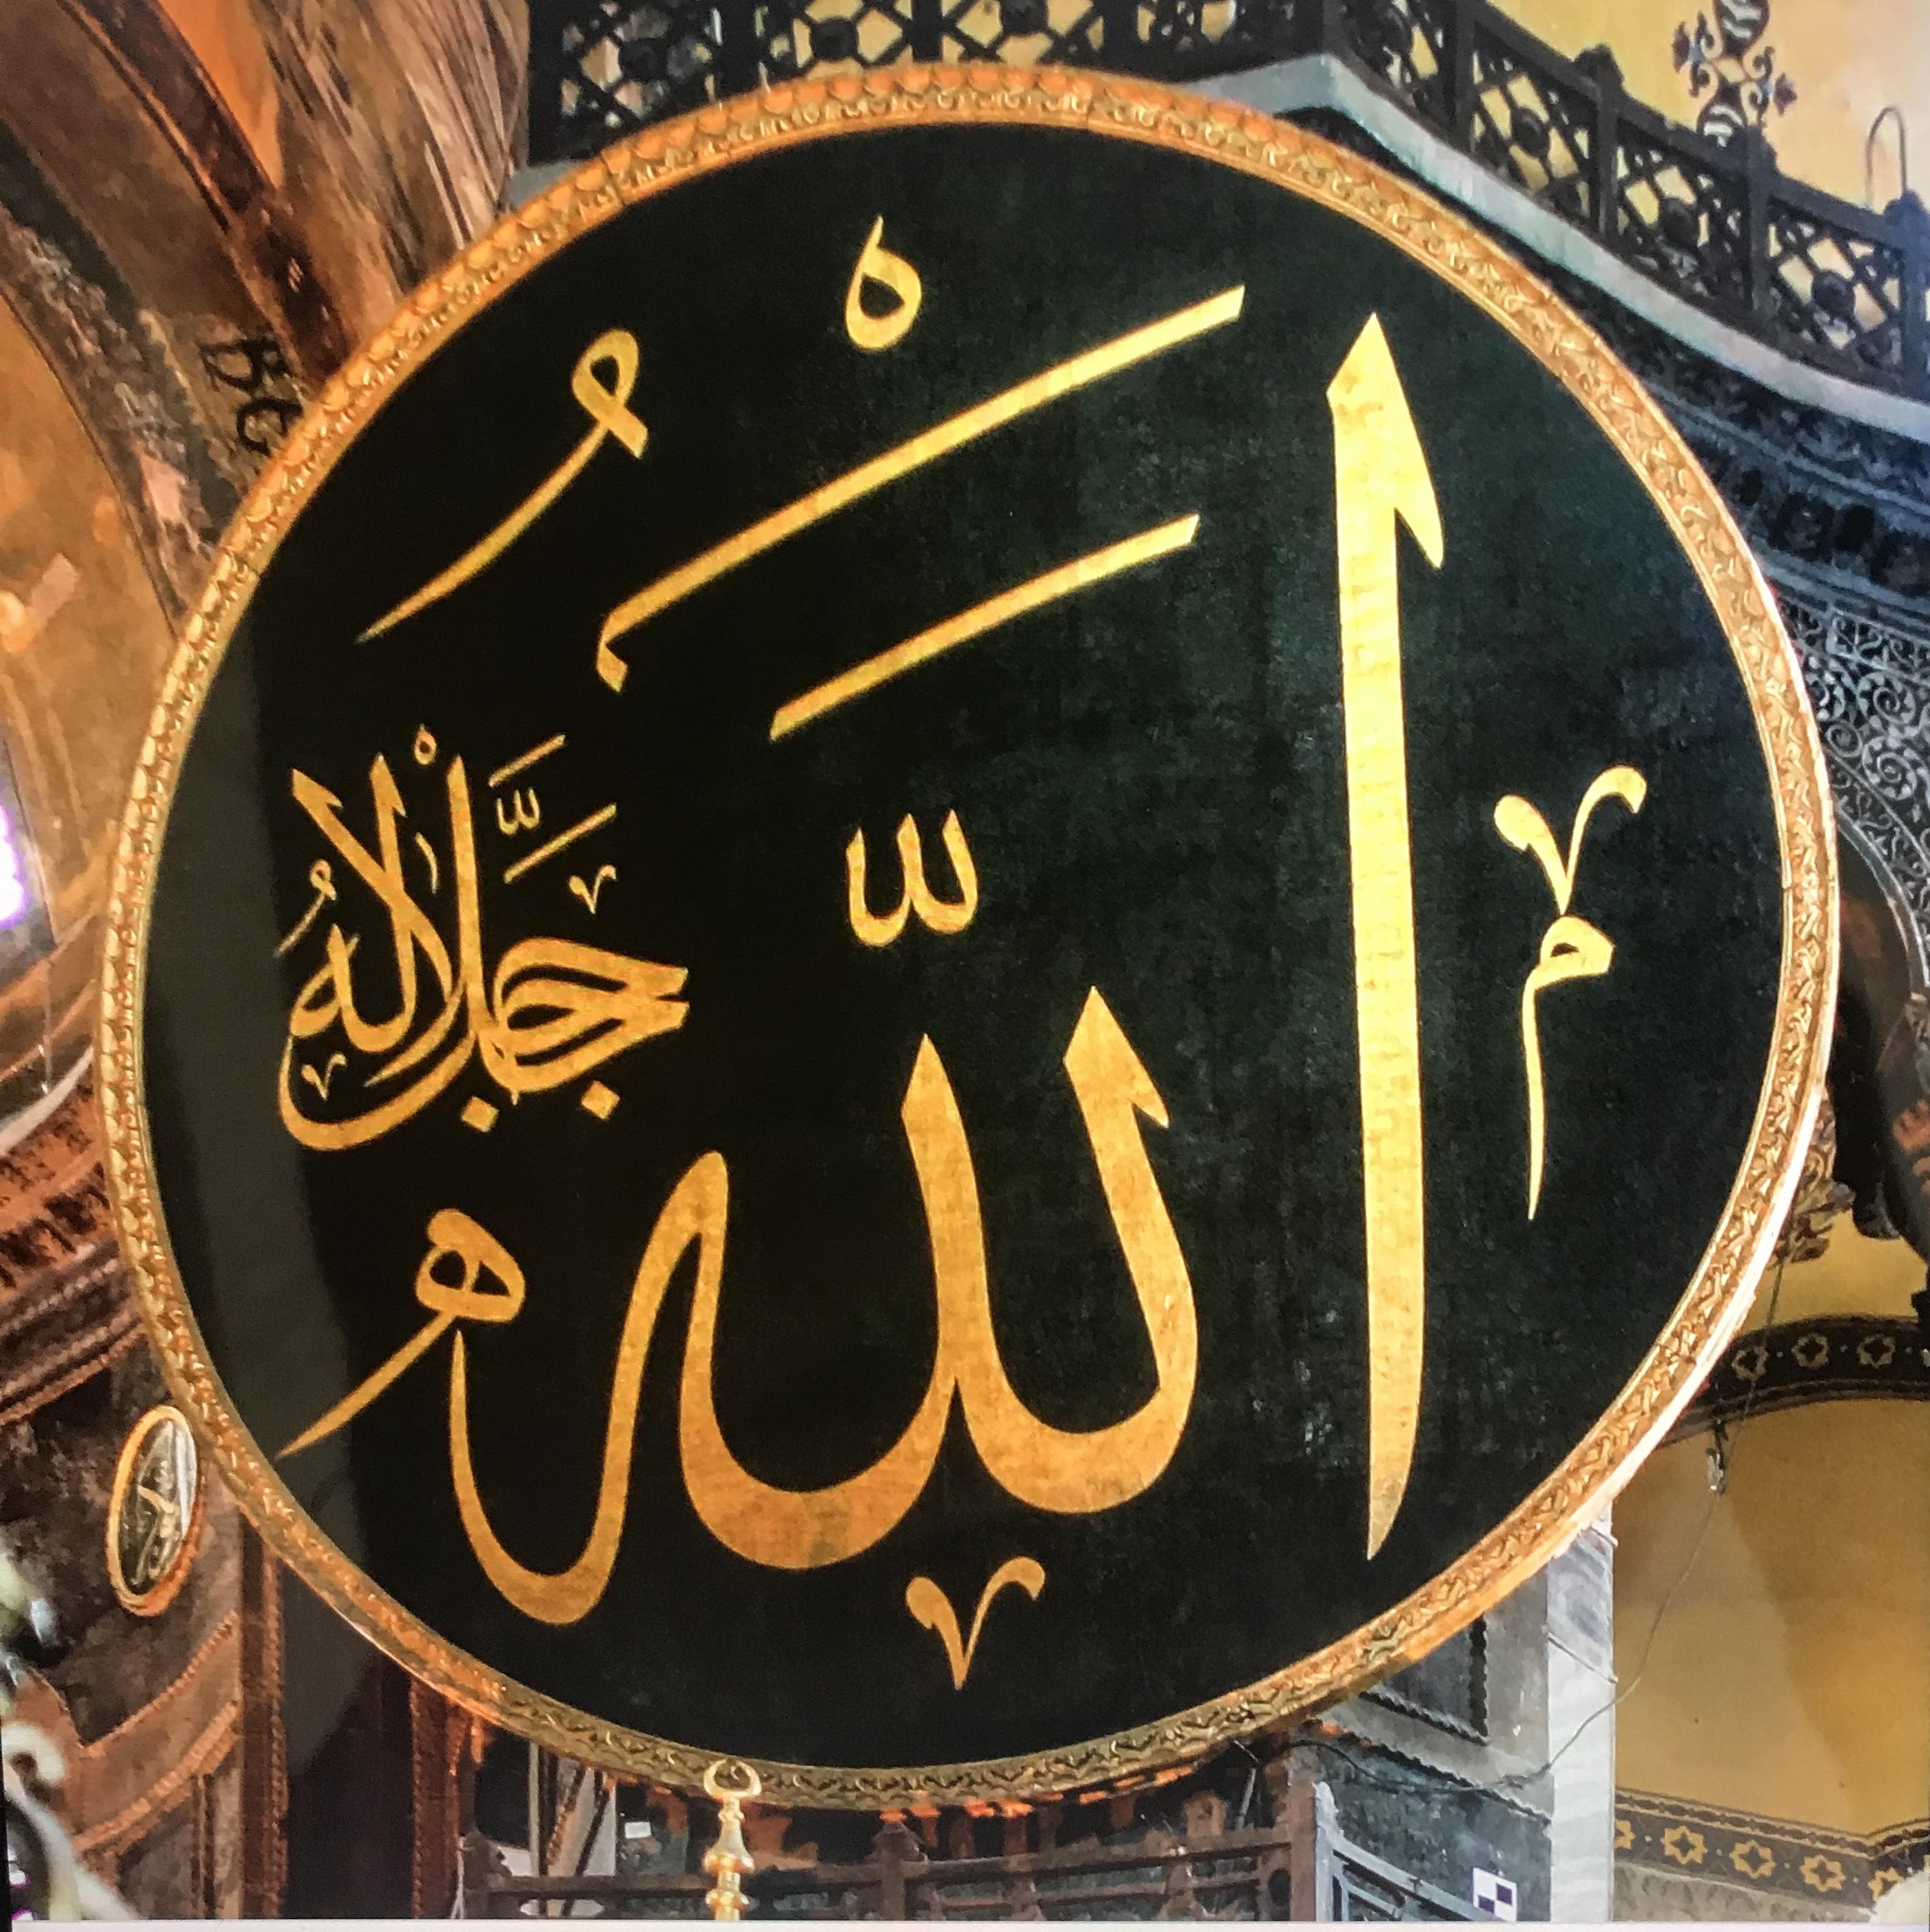 Profile picture of Sunni_brother